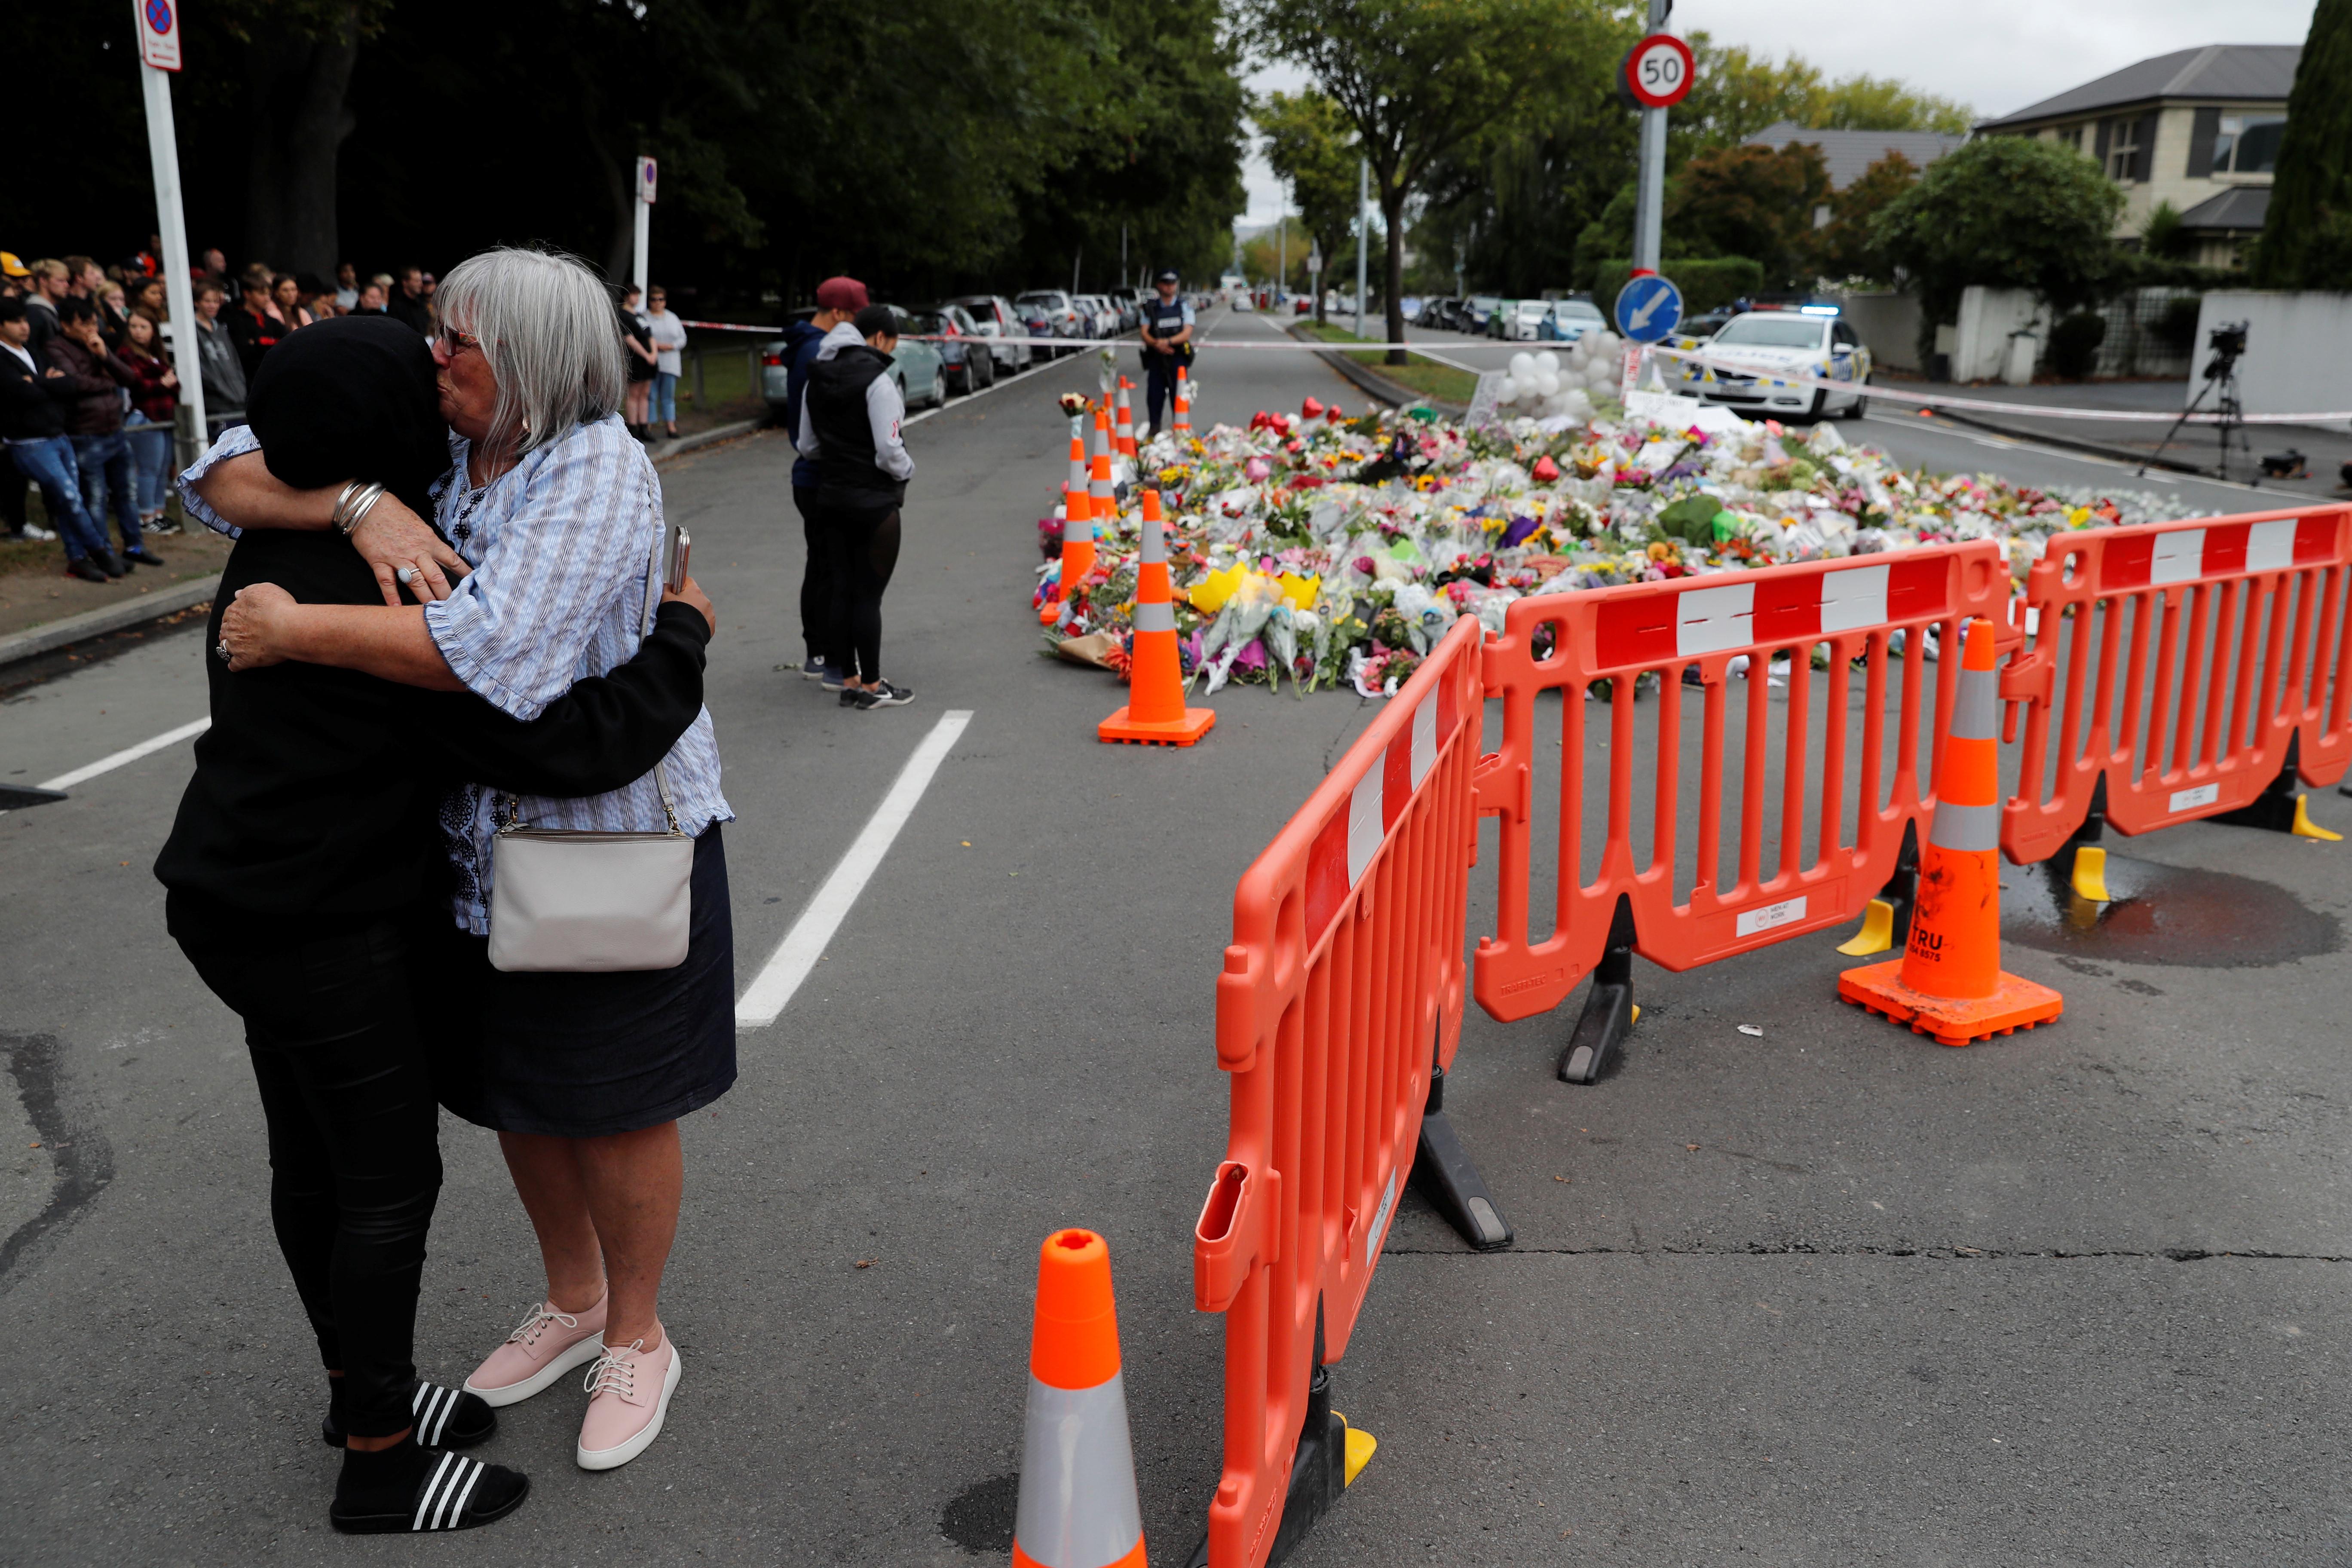 Facebook excluiu 1,5 milhão de vídeos de ataque na Nova Zelândia